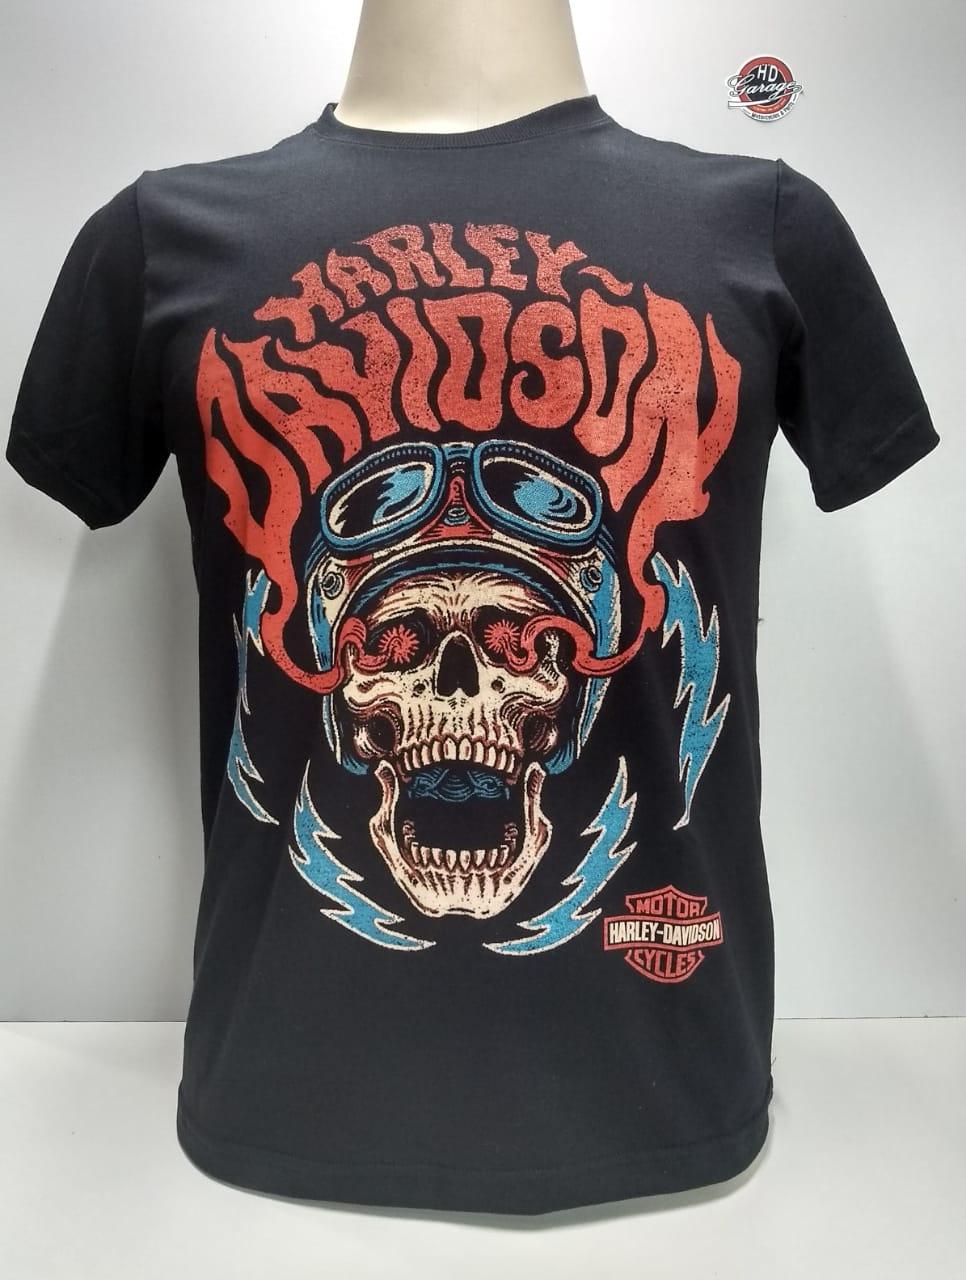 Camiseta Masculina - Motivo Harley-Davidson - Preta Mod 12 - 026/62928